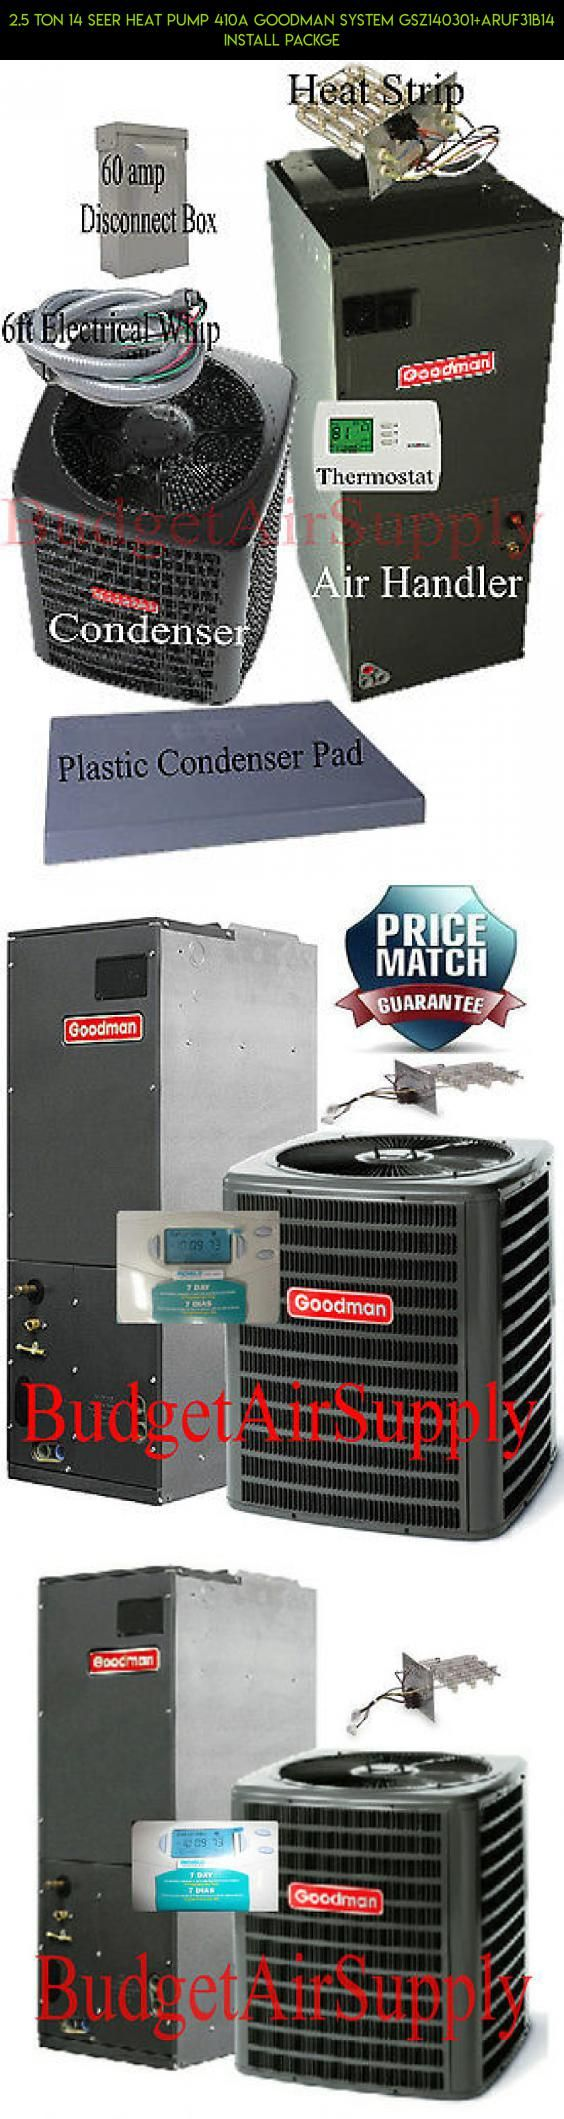 How To Install A Heat Pump The 25 Best Heat Pump Installation Ideas On Pinterest Heat Pump